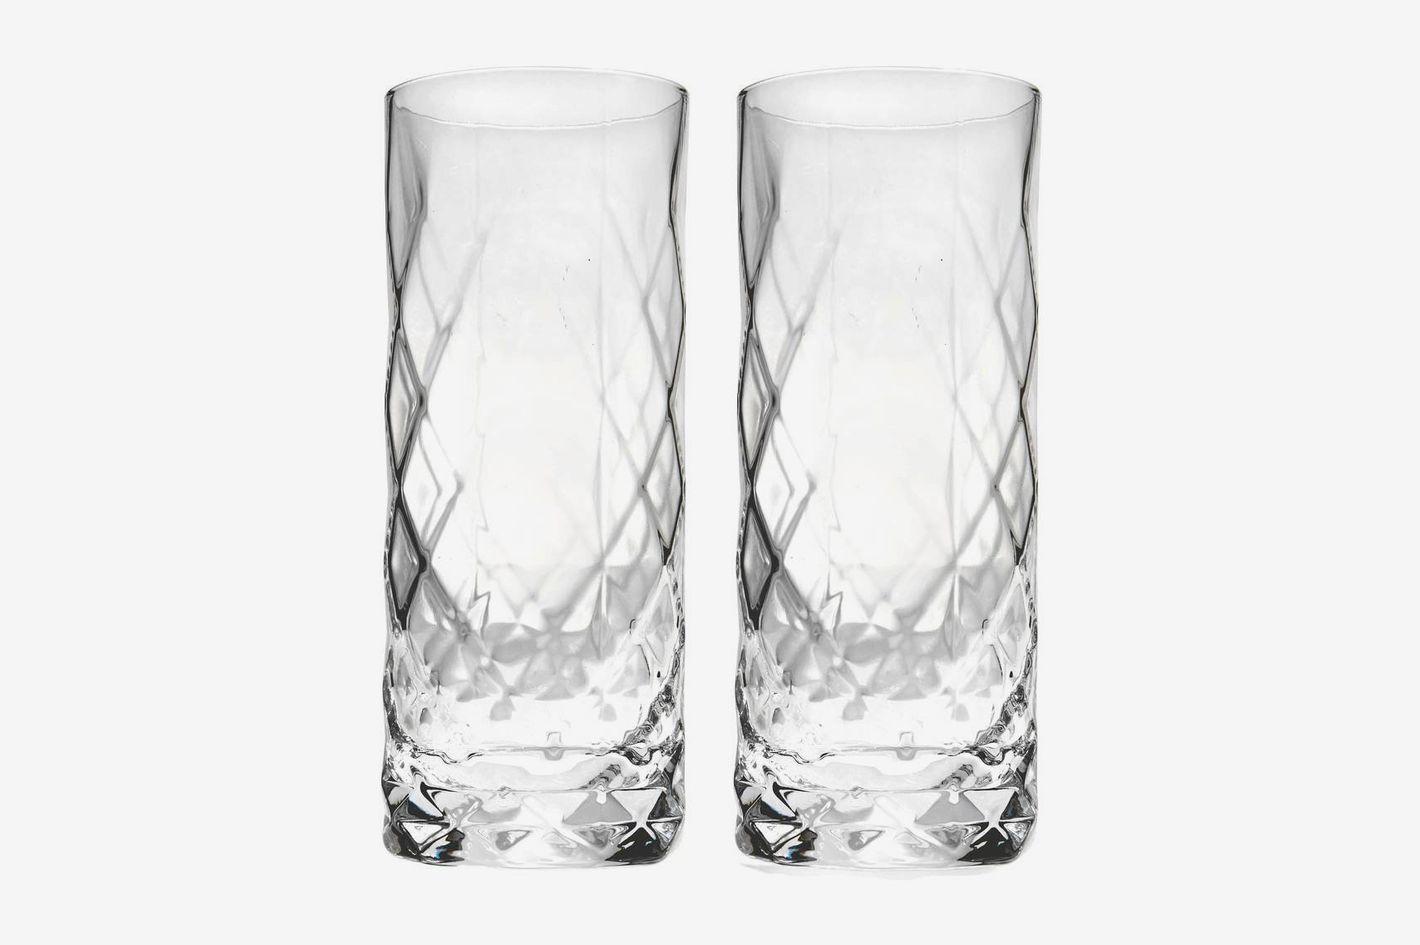 Viski by True Fabrications Set of 2 Highball Glasses